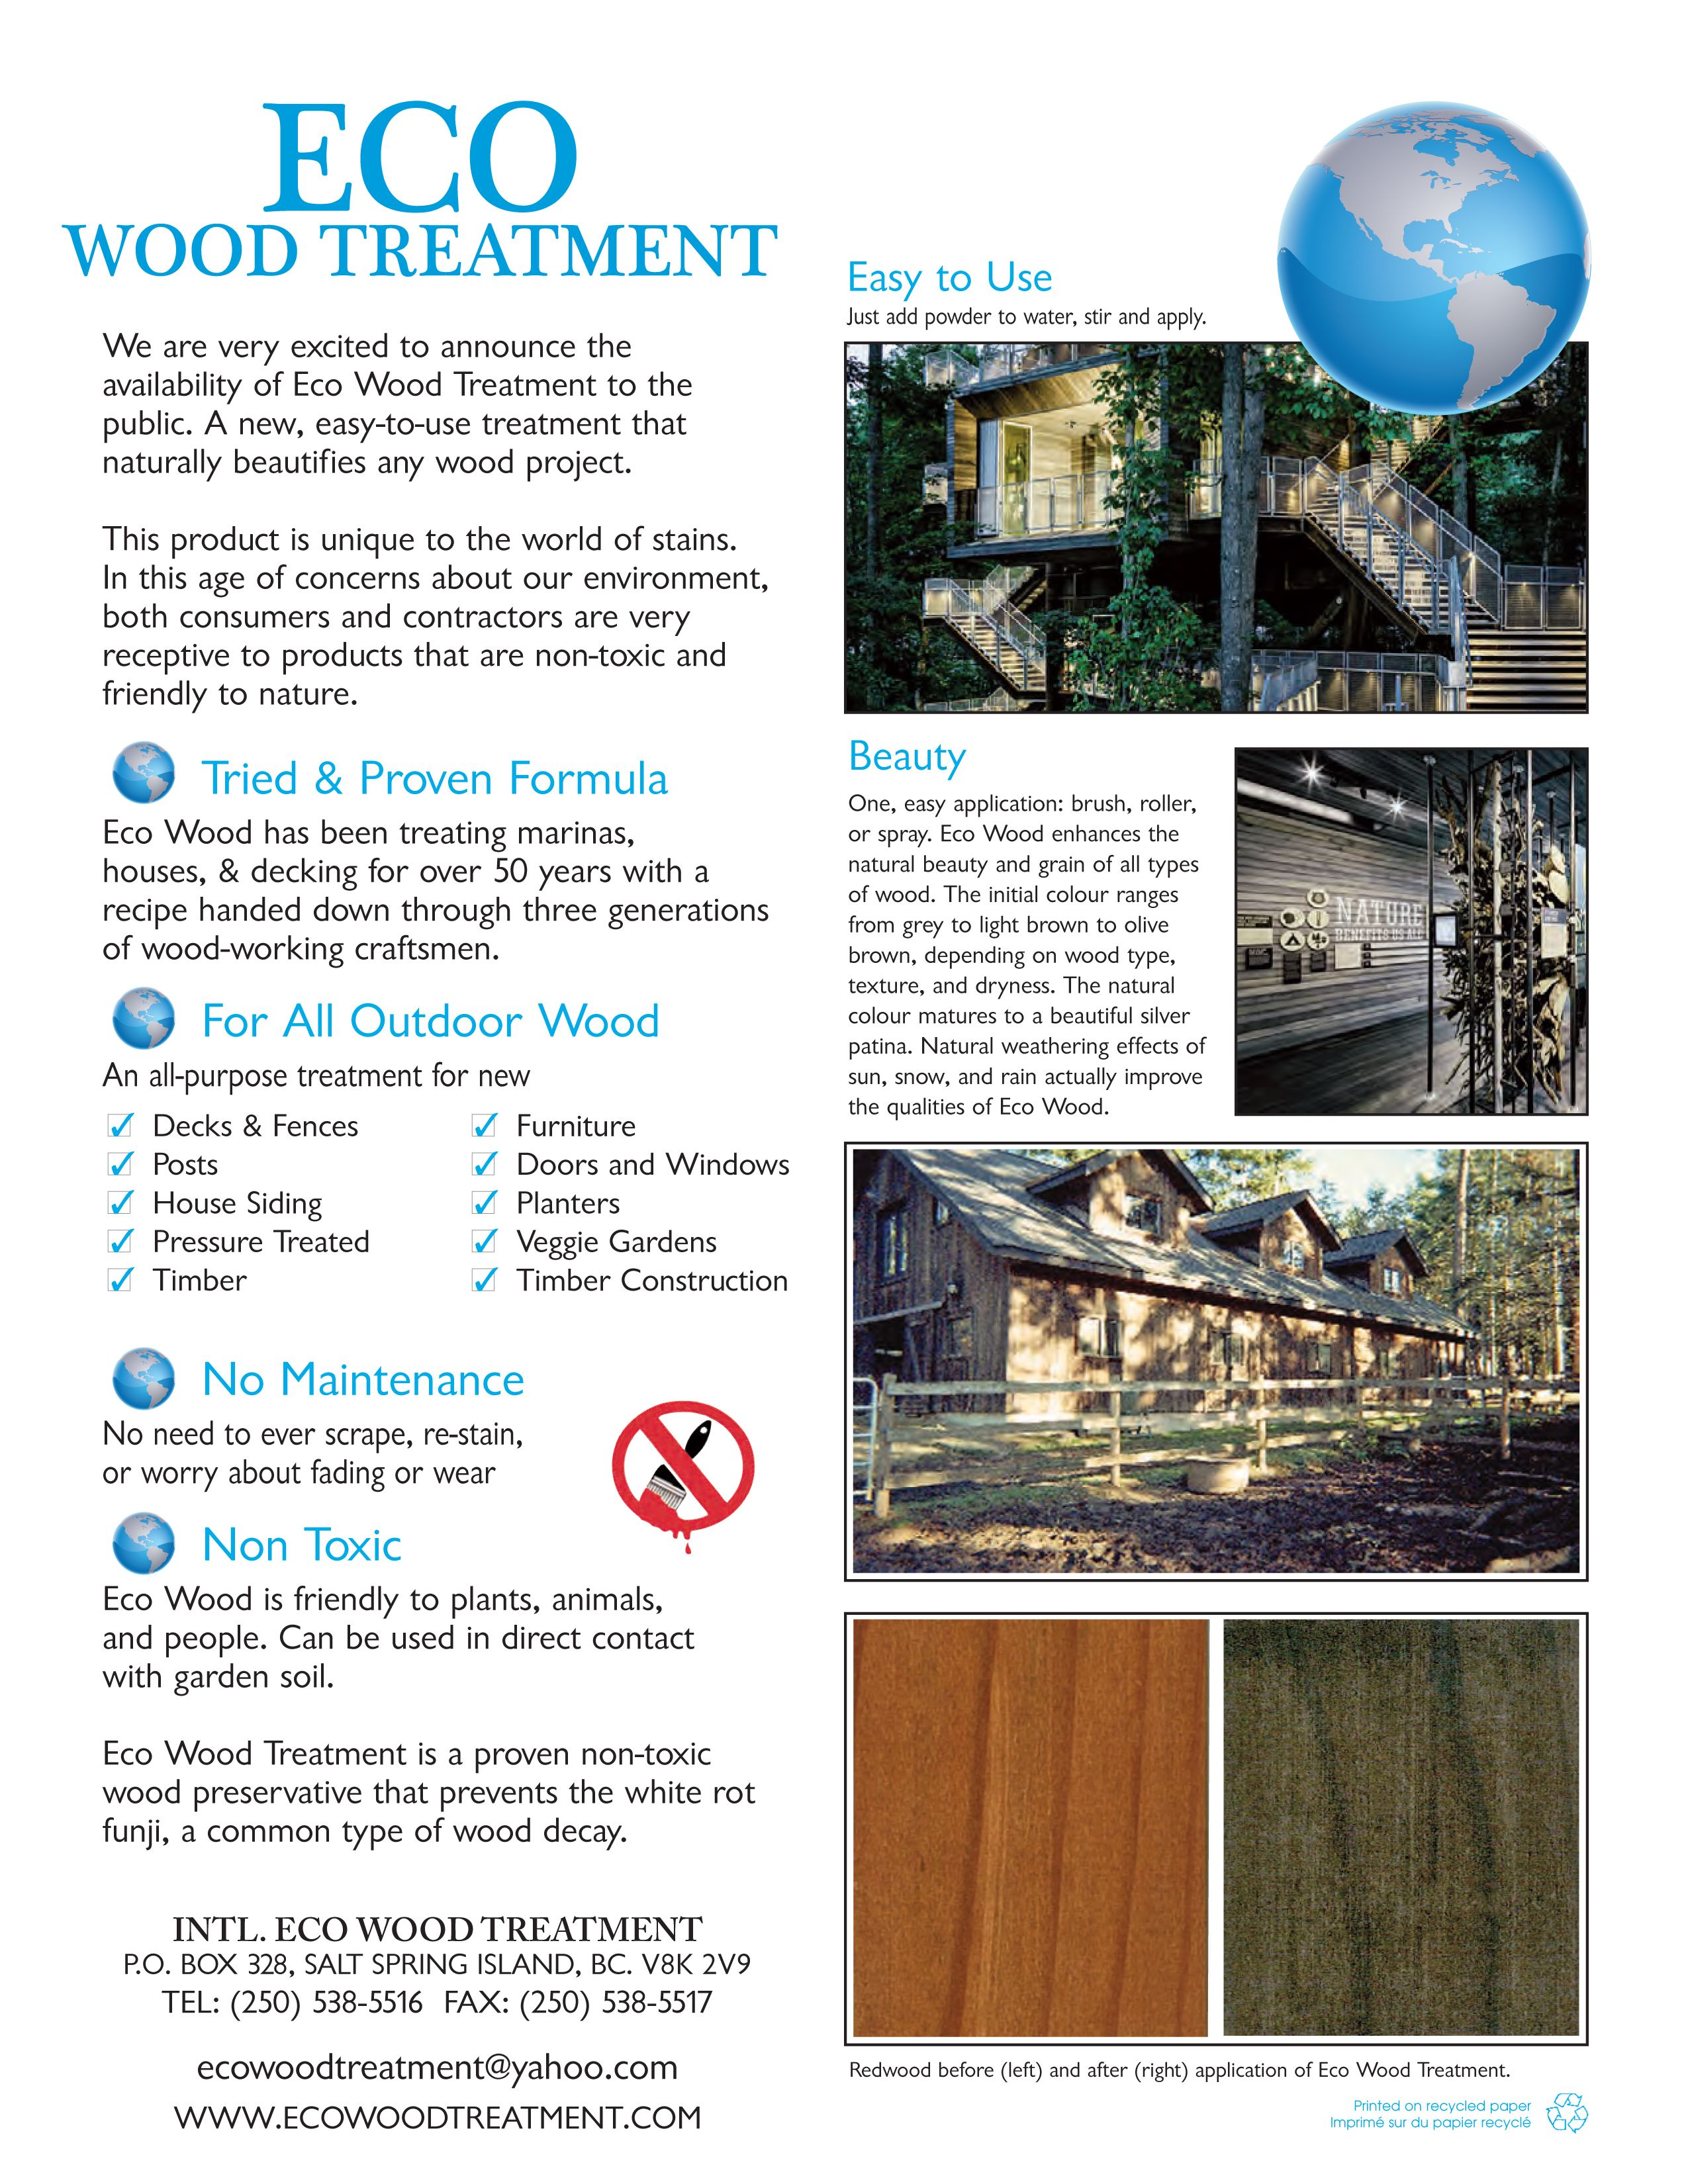 ecowoodtreatment com | Home It! in 2019 | Grey wood, Wood